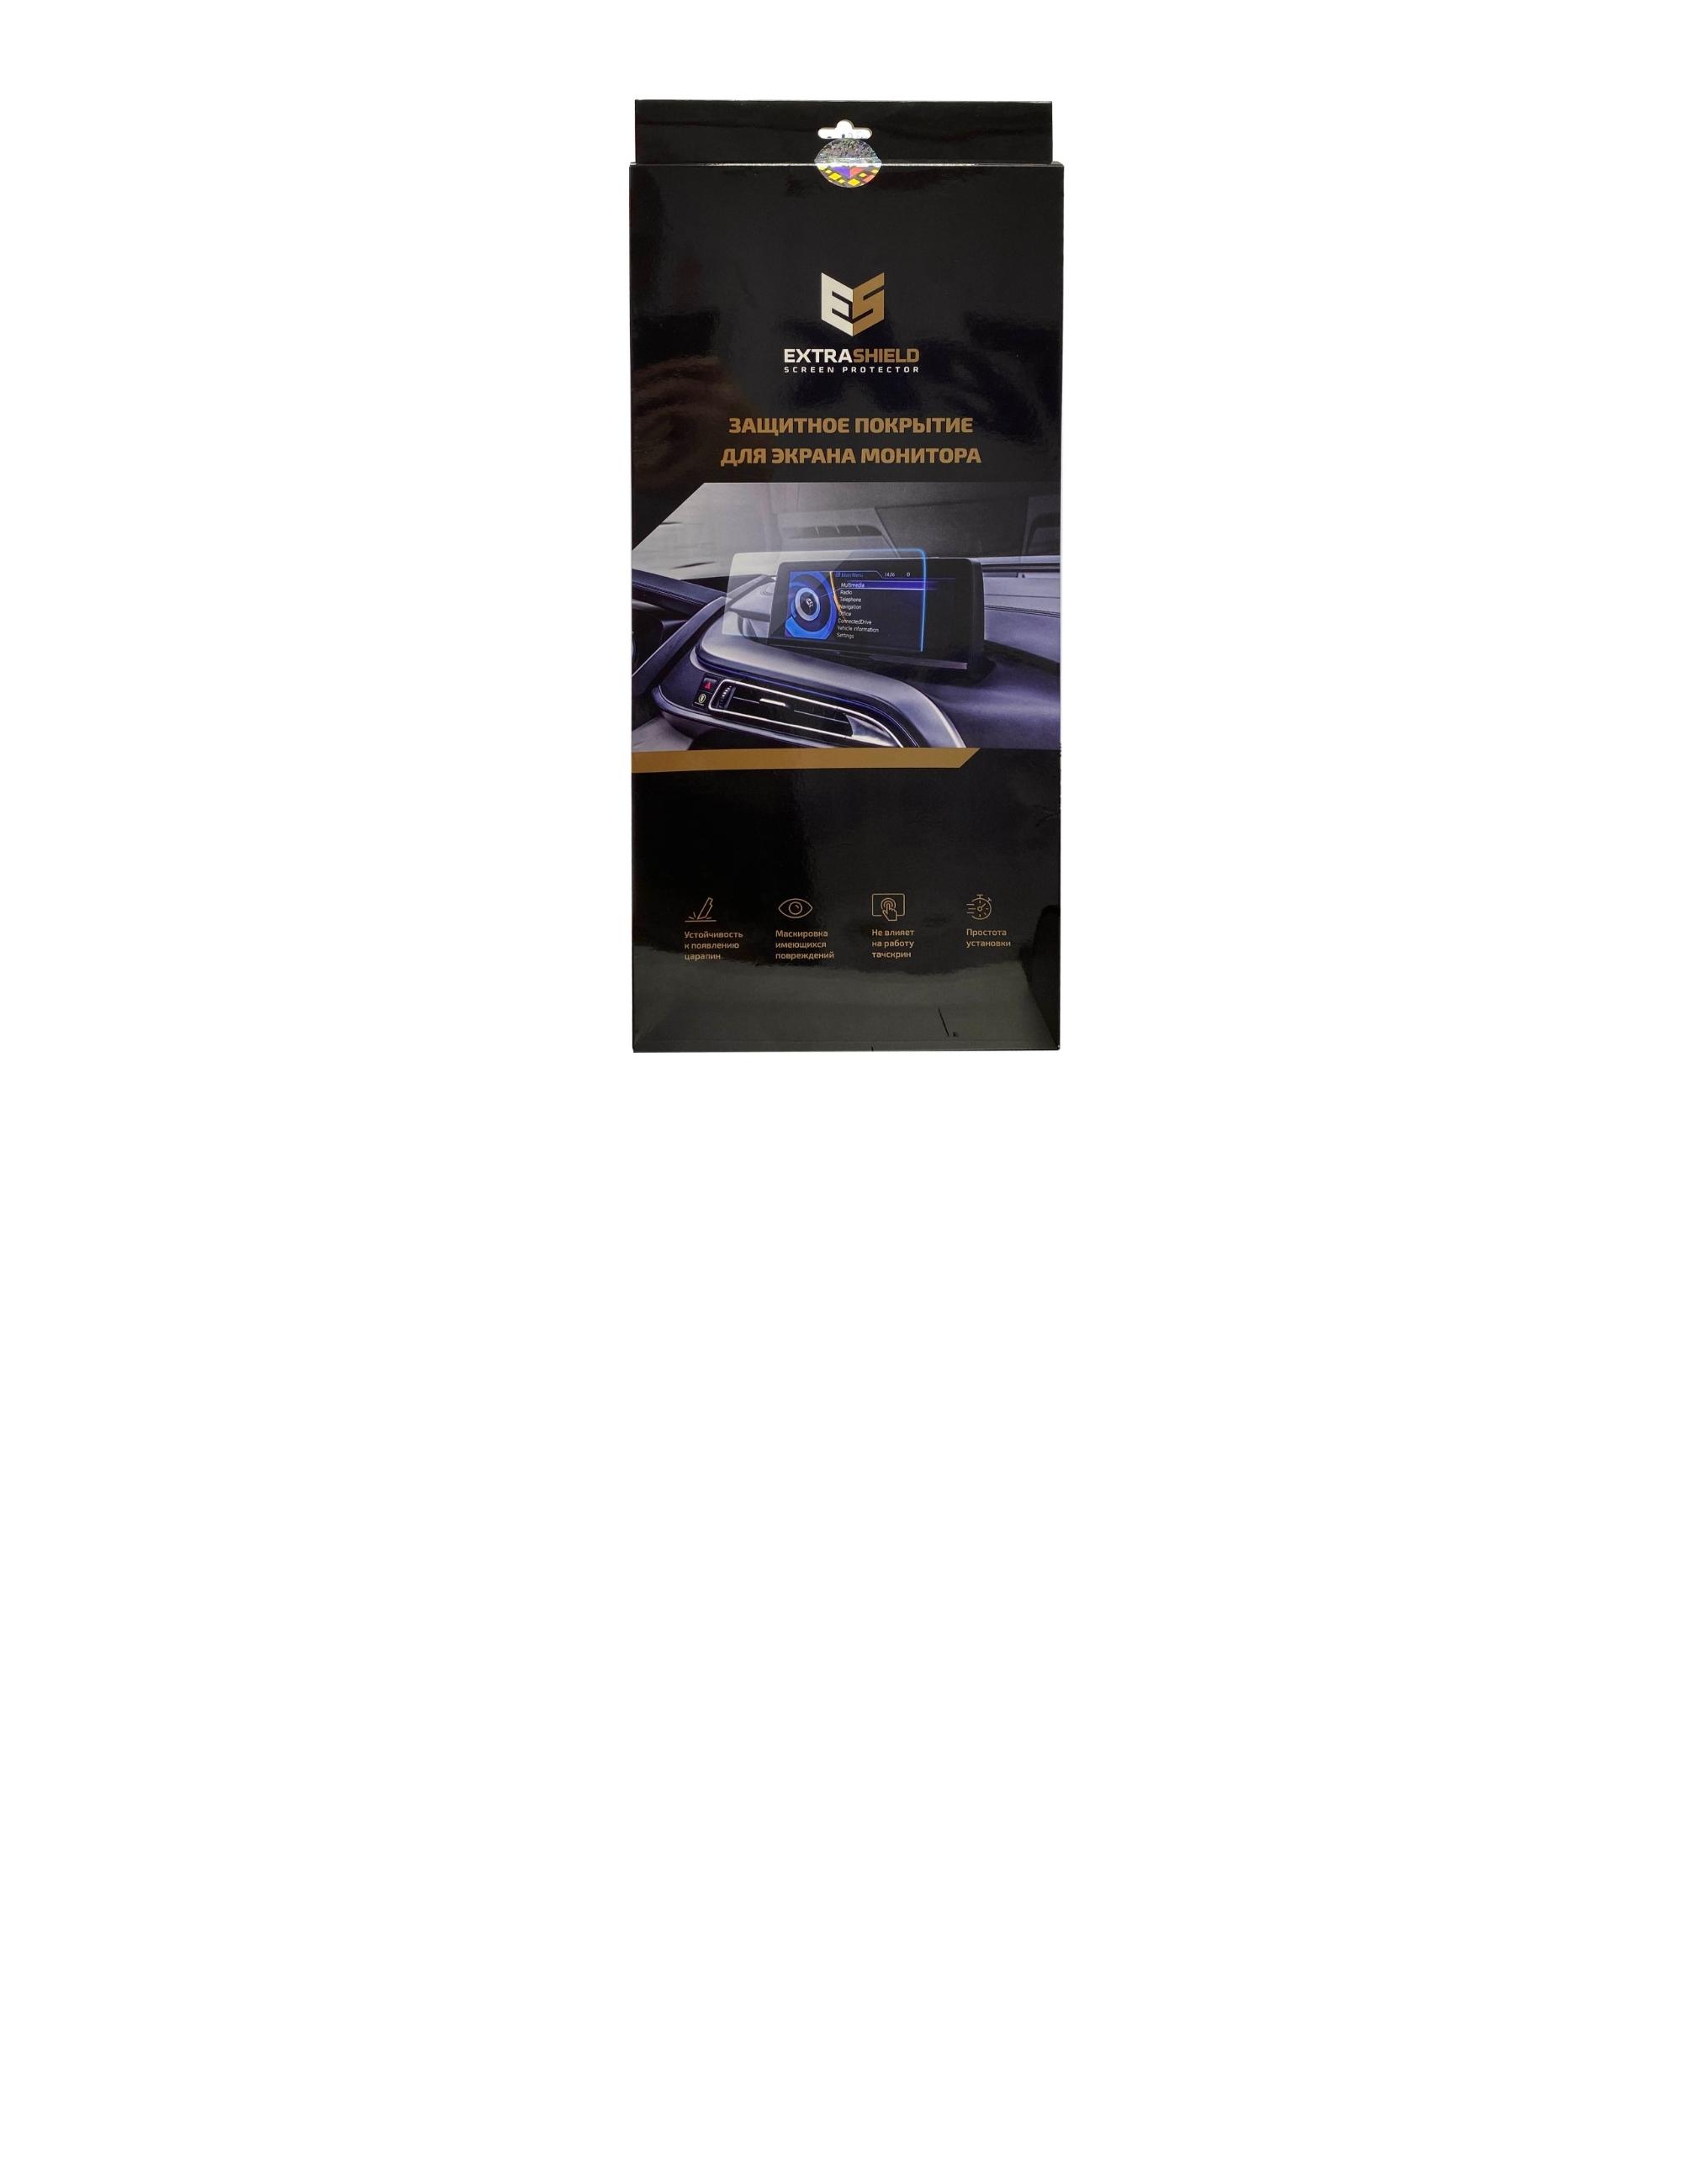 Mercedes-Benz GLA (X156) CLA (W117) 2017 - 2020 мультимедиа 8 Защитное стекло Матовая